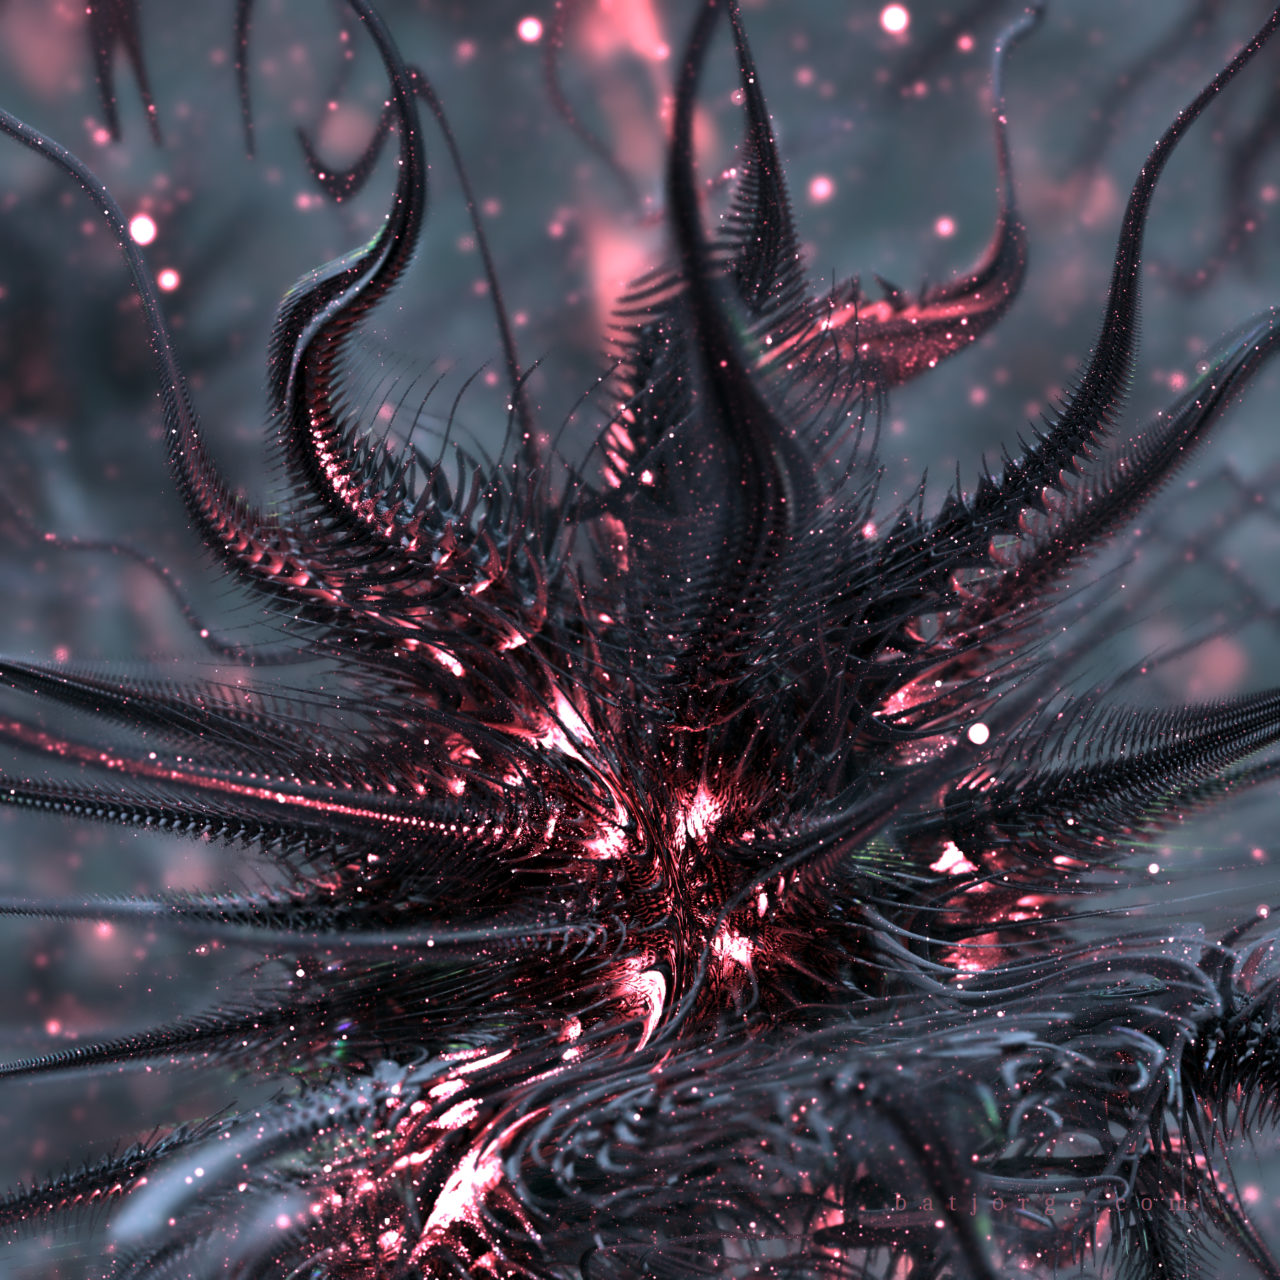 3de fractal mandelbulb dark spiked